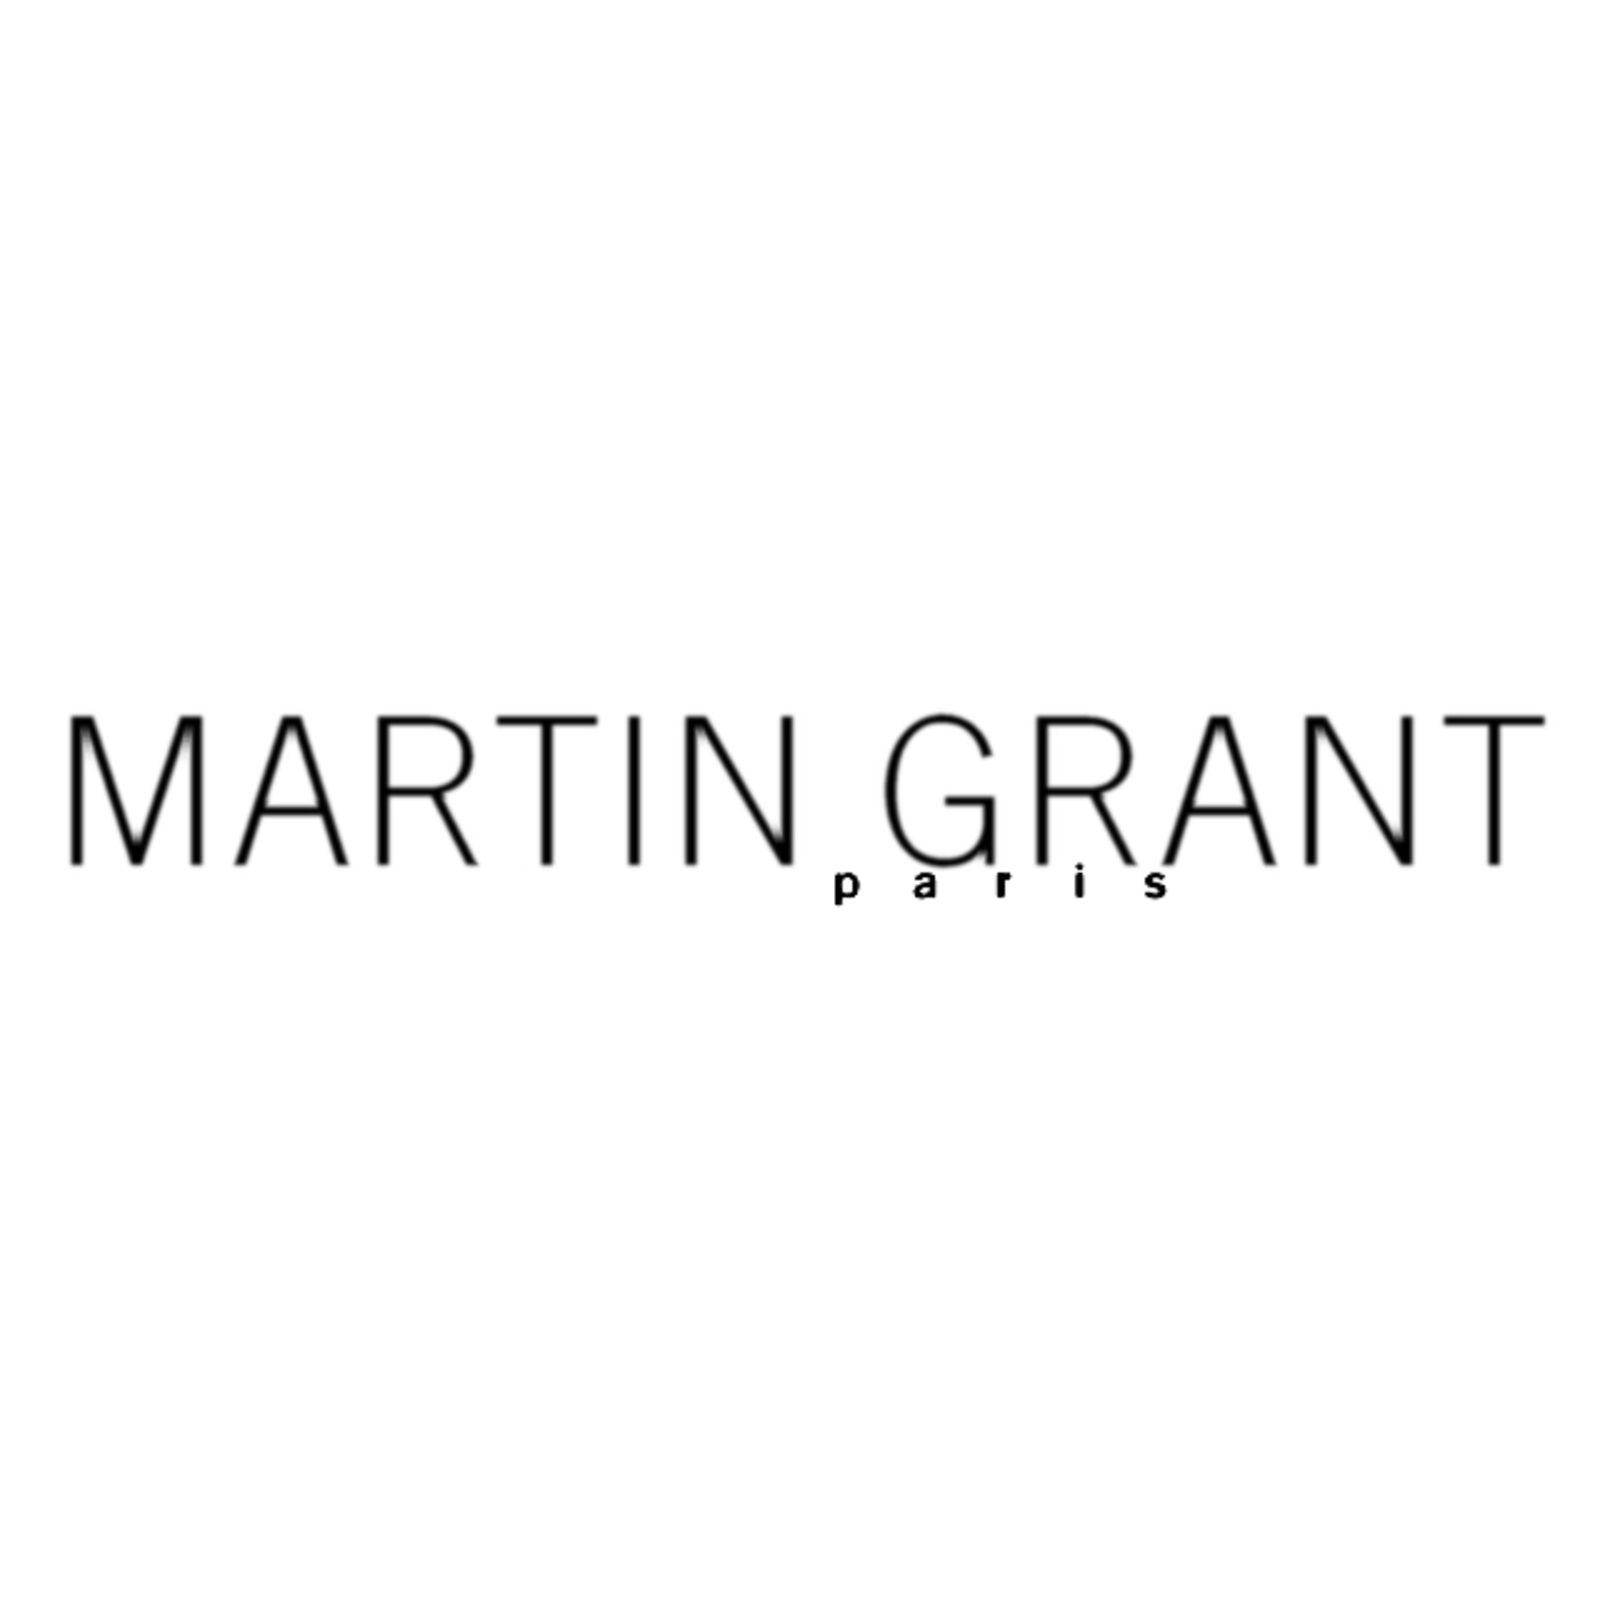 Martin Grant (Bild 1)